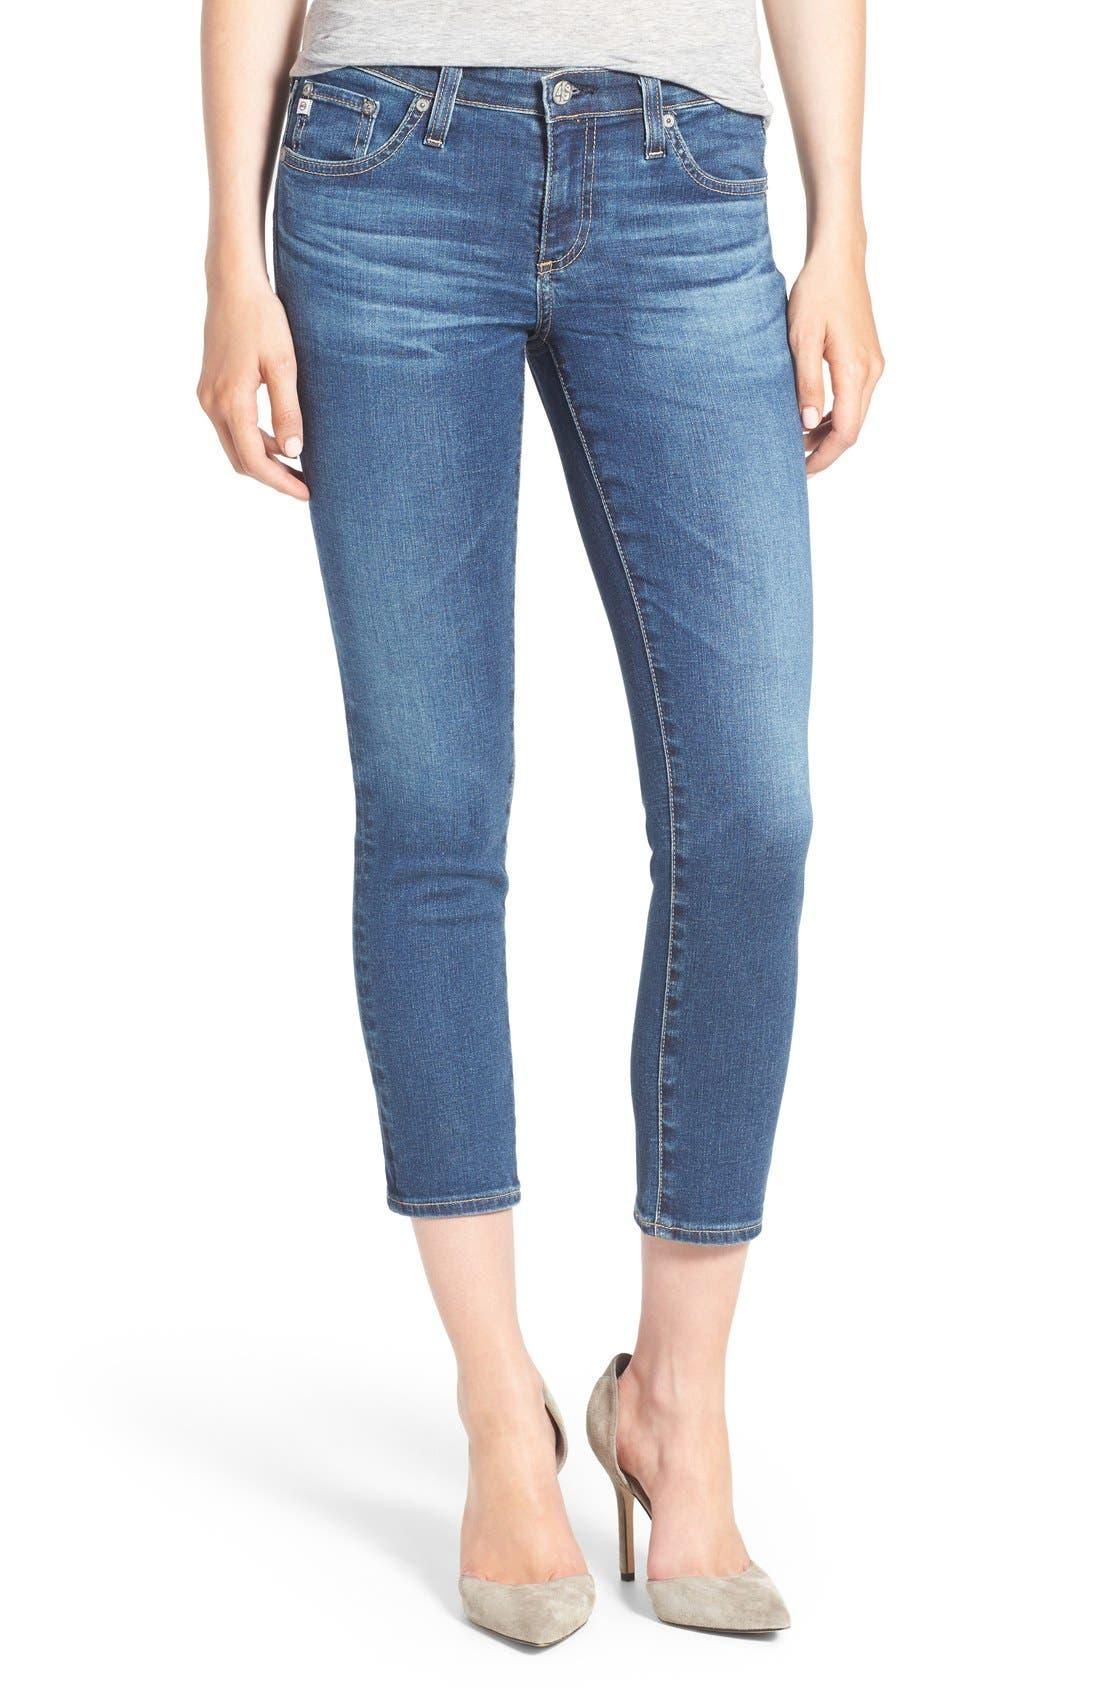 Alternate Image 1 Selected - AG Jeans 'The Stilt' Crop Skinny Stretch Jeans